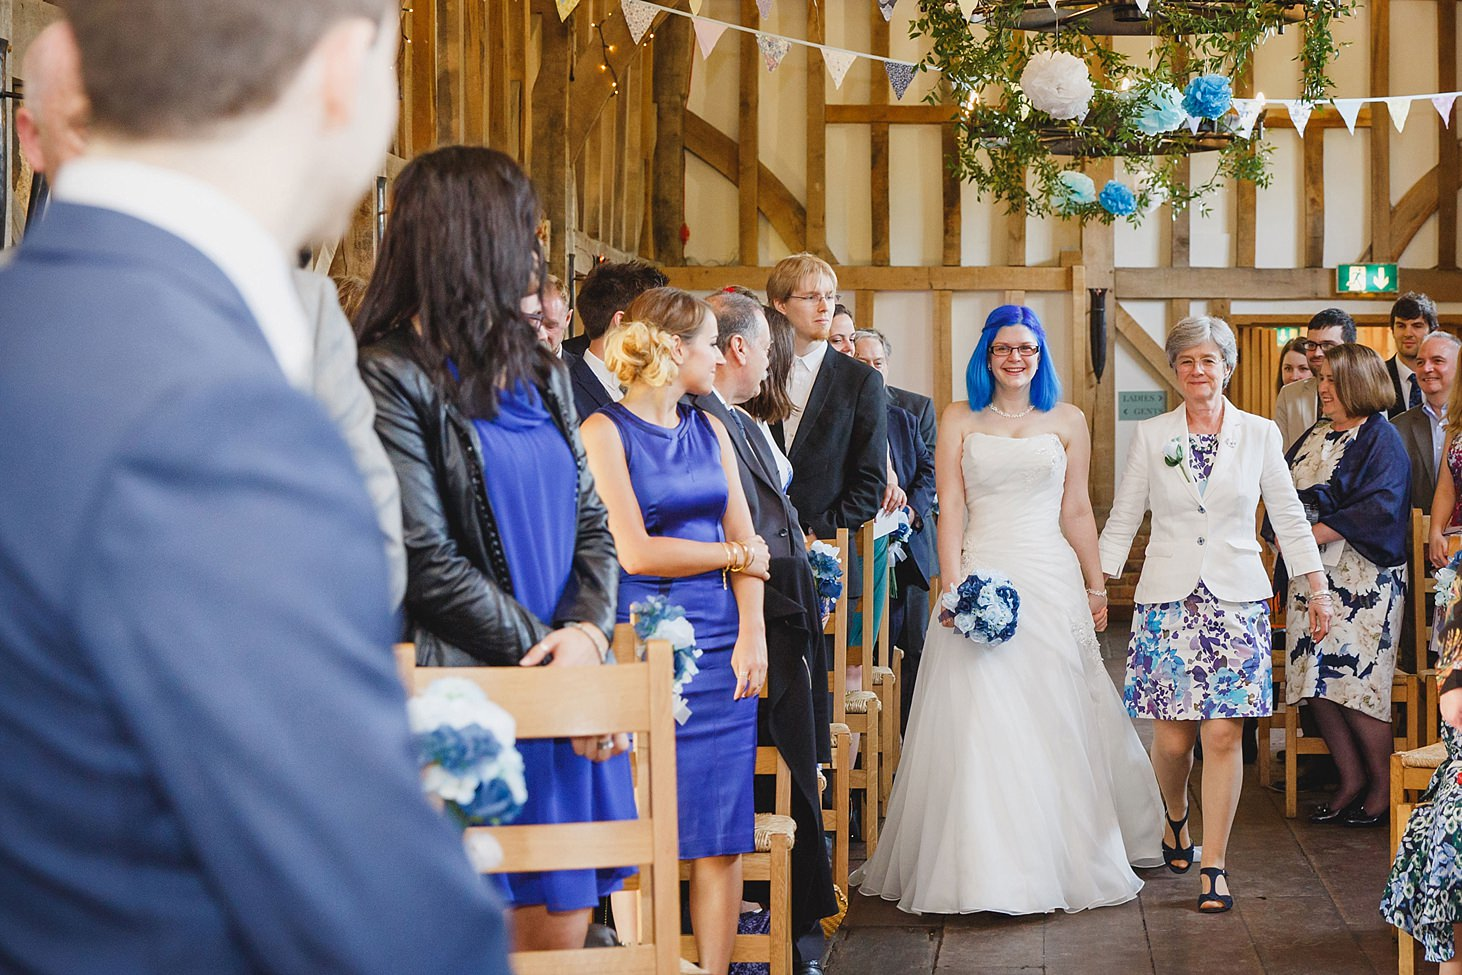 gate street barn wedding photography bride walking down aisle with her mum